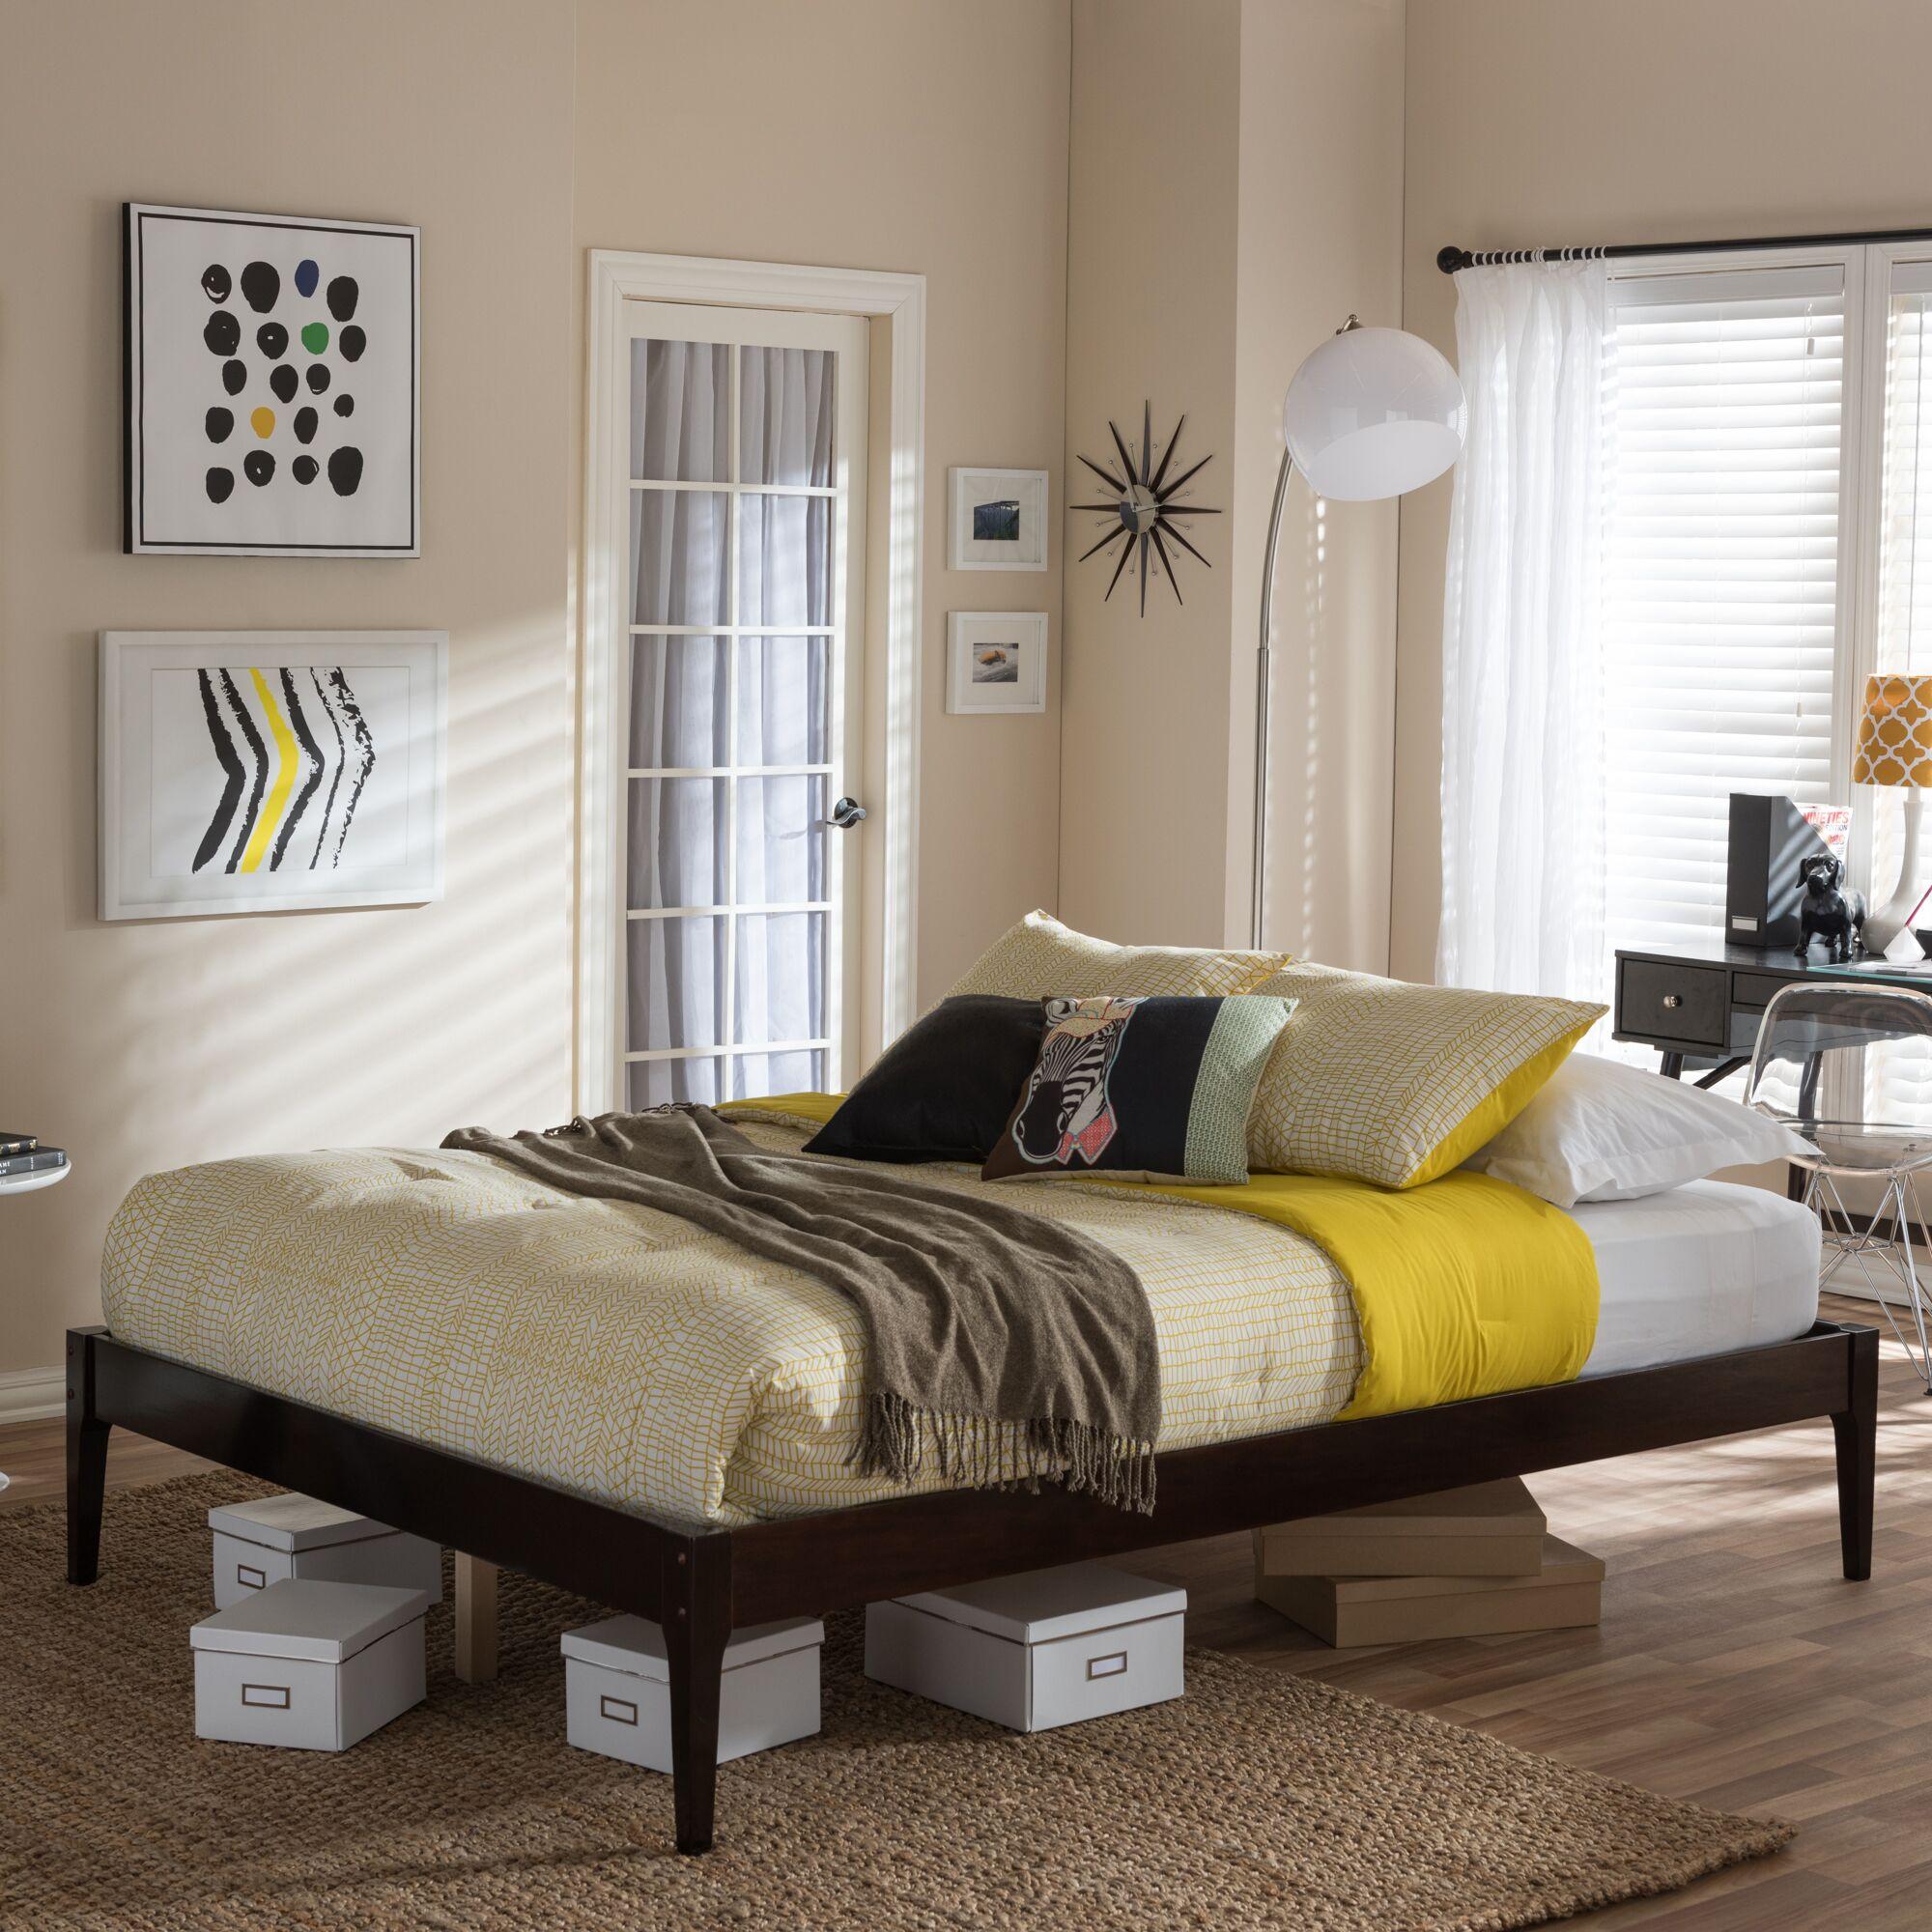 Smoak Platform Bed Size: Queen, Color: Walnut